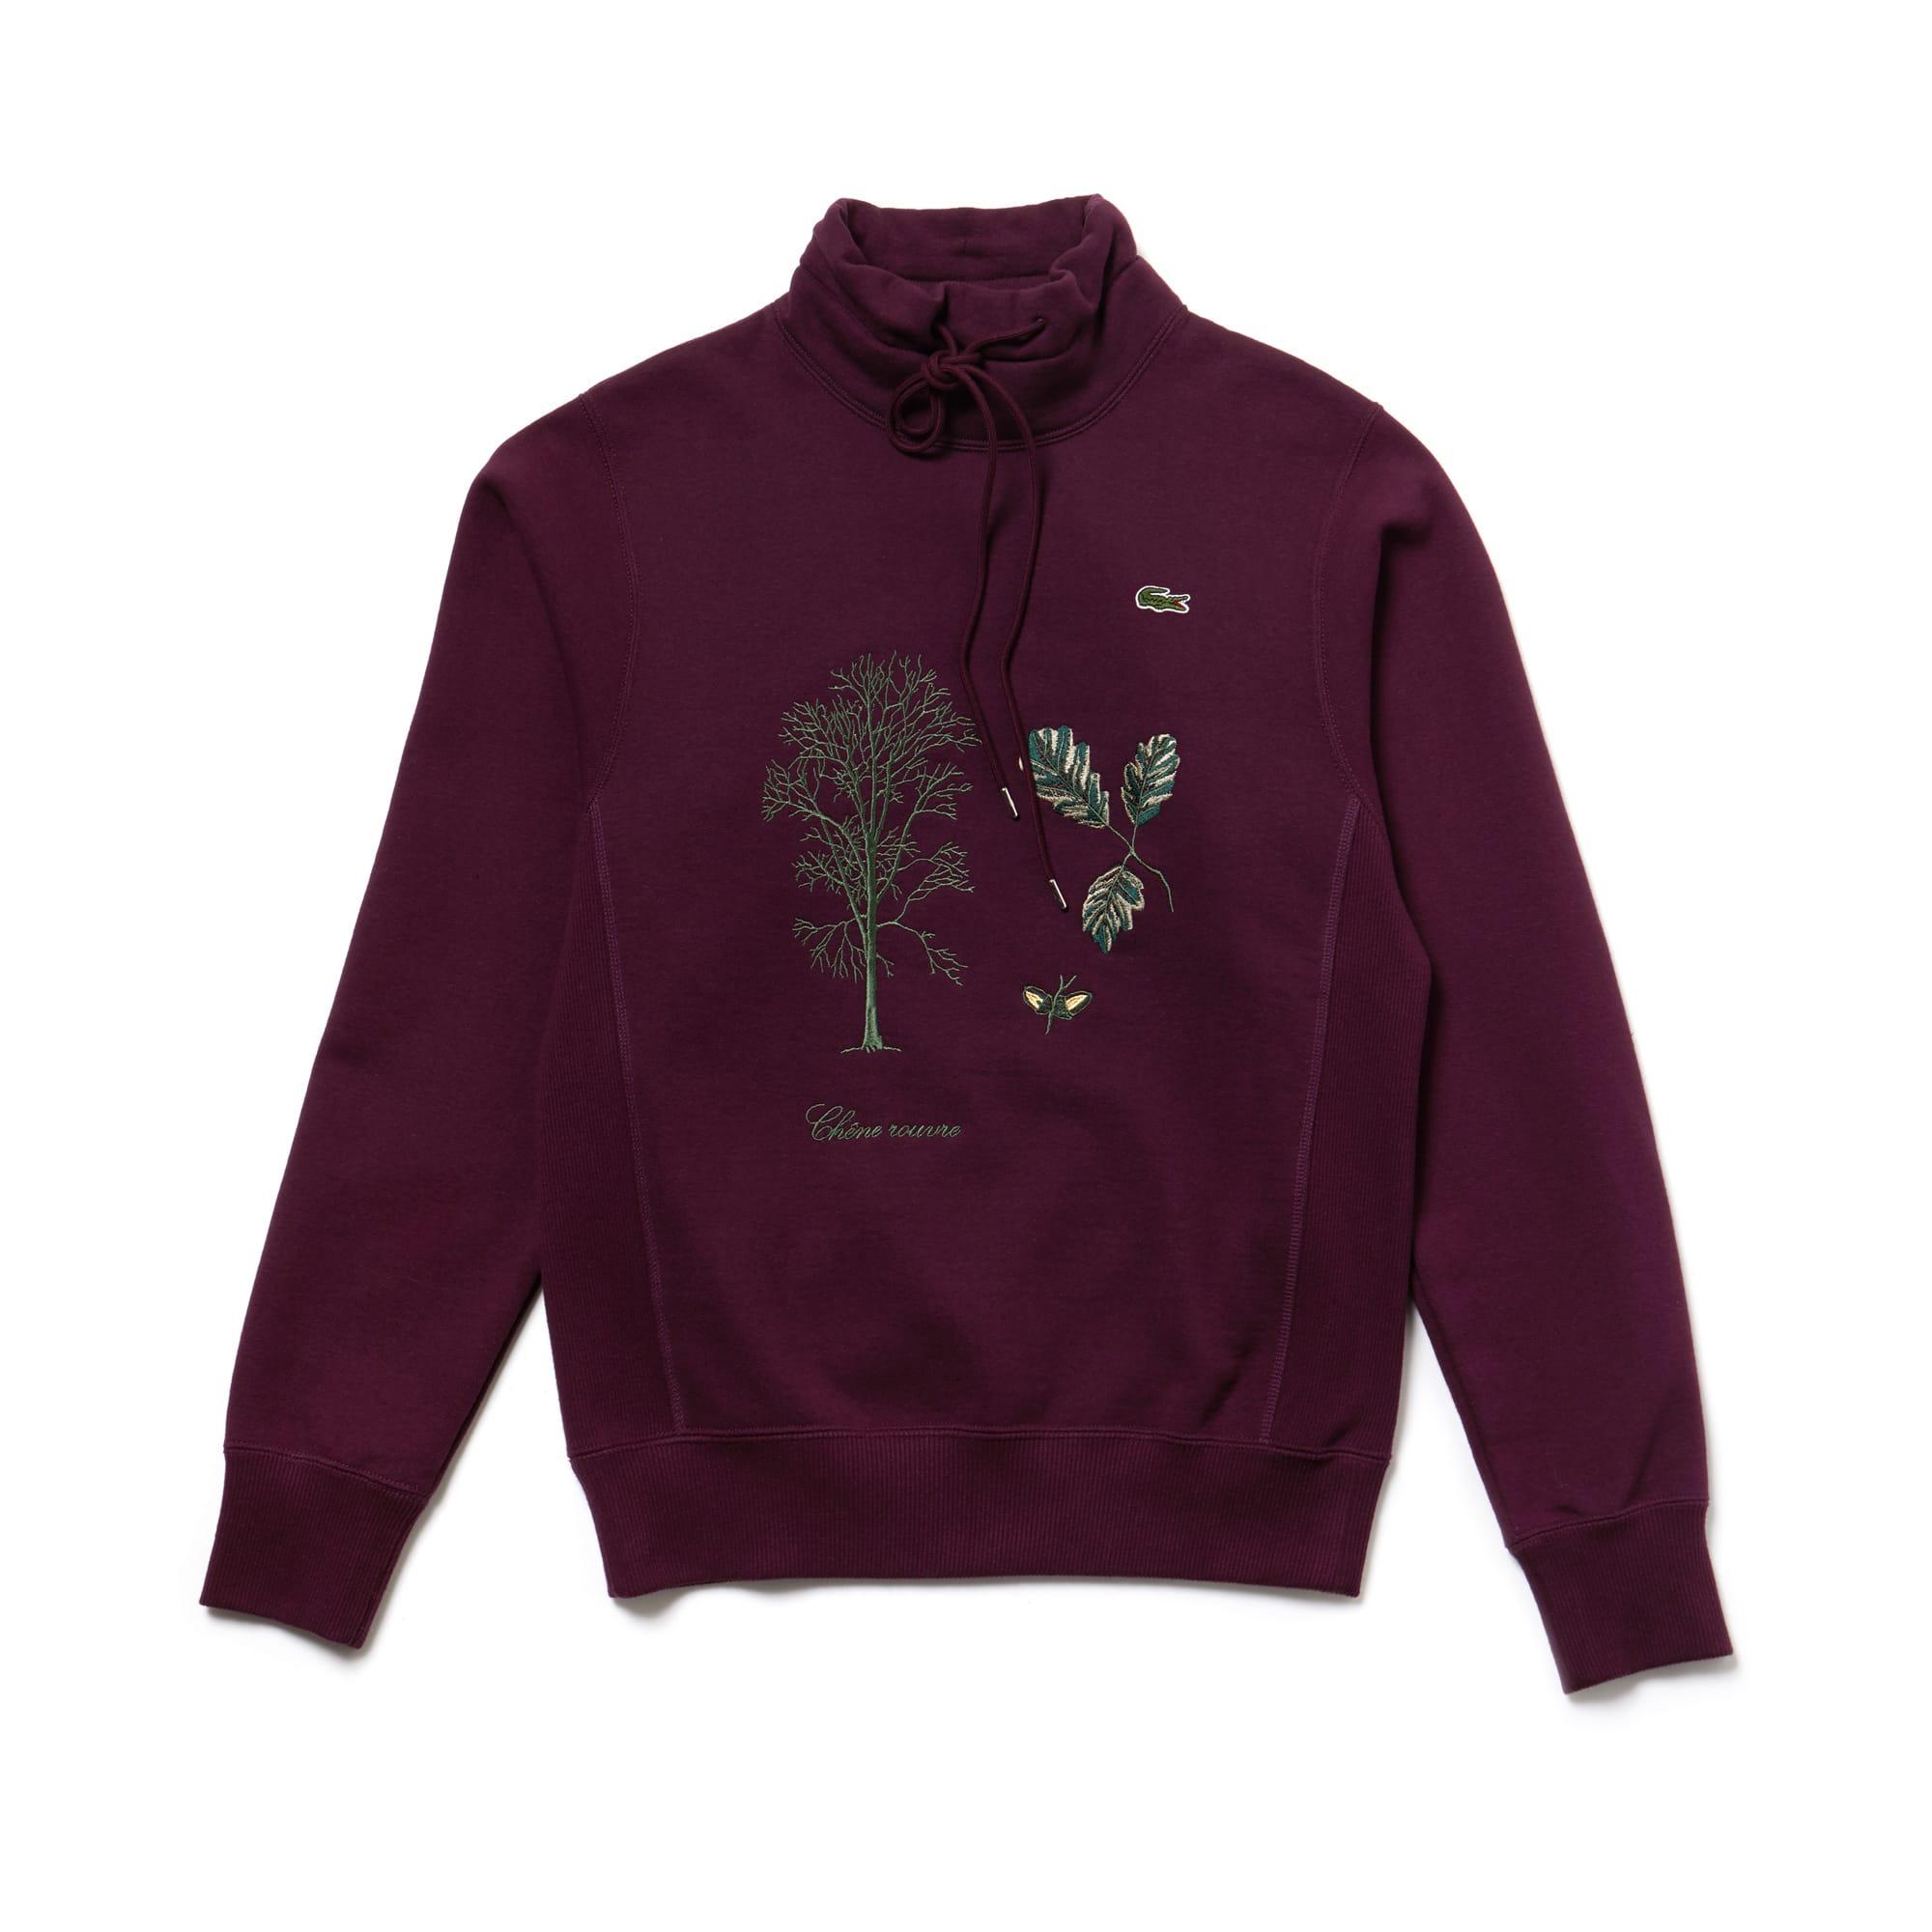 Unisex Fashion Show Stand-Up Collar Embroidered Fleece Sweatshirt